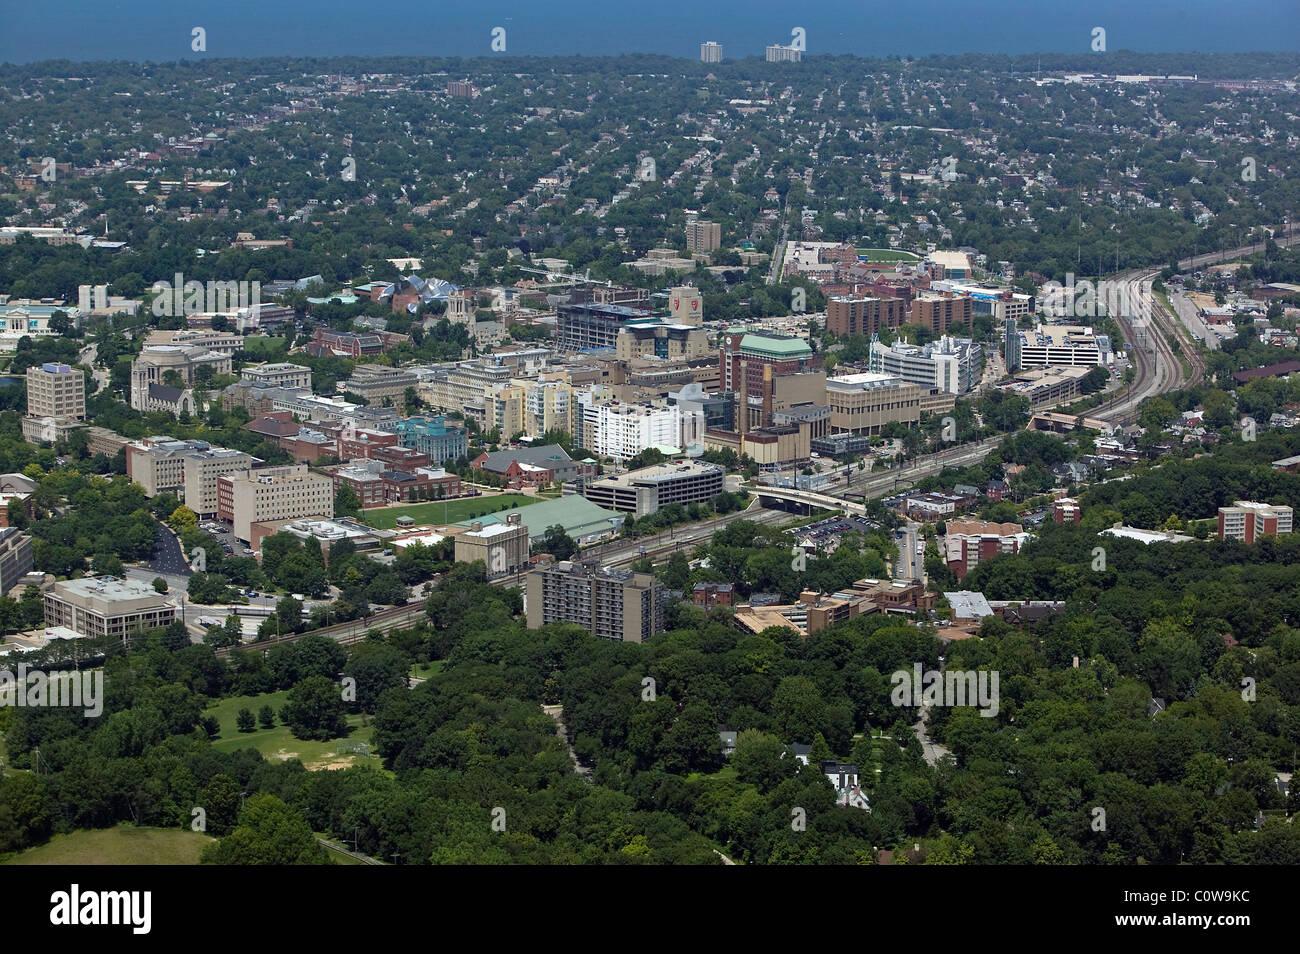 Vista aérea sobre medical campus Clínica Cleveland Ohio Imagen De Stock